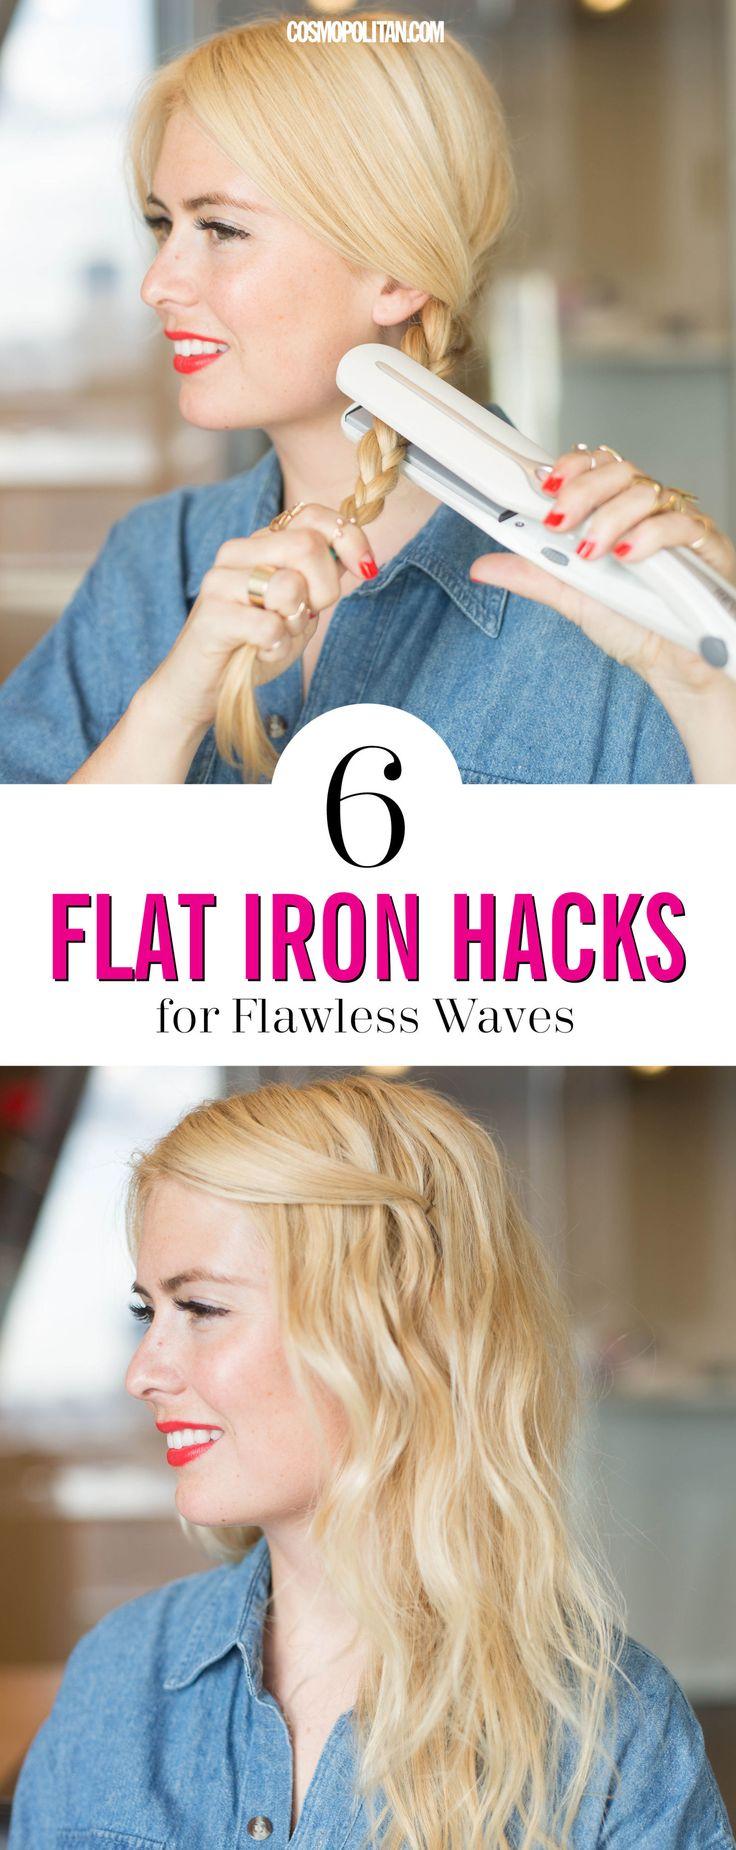 6 Flat Iron Hacks for Flawless Waves  - Cosmopolitan.com